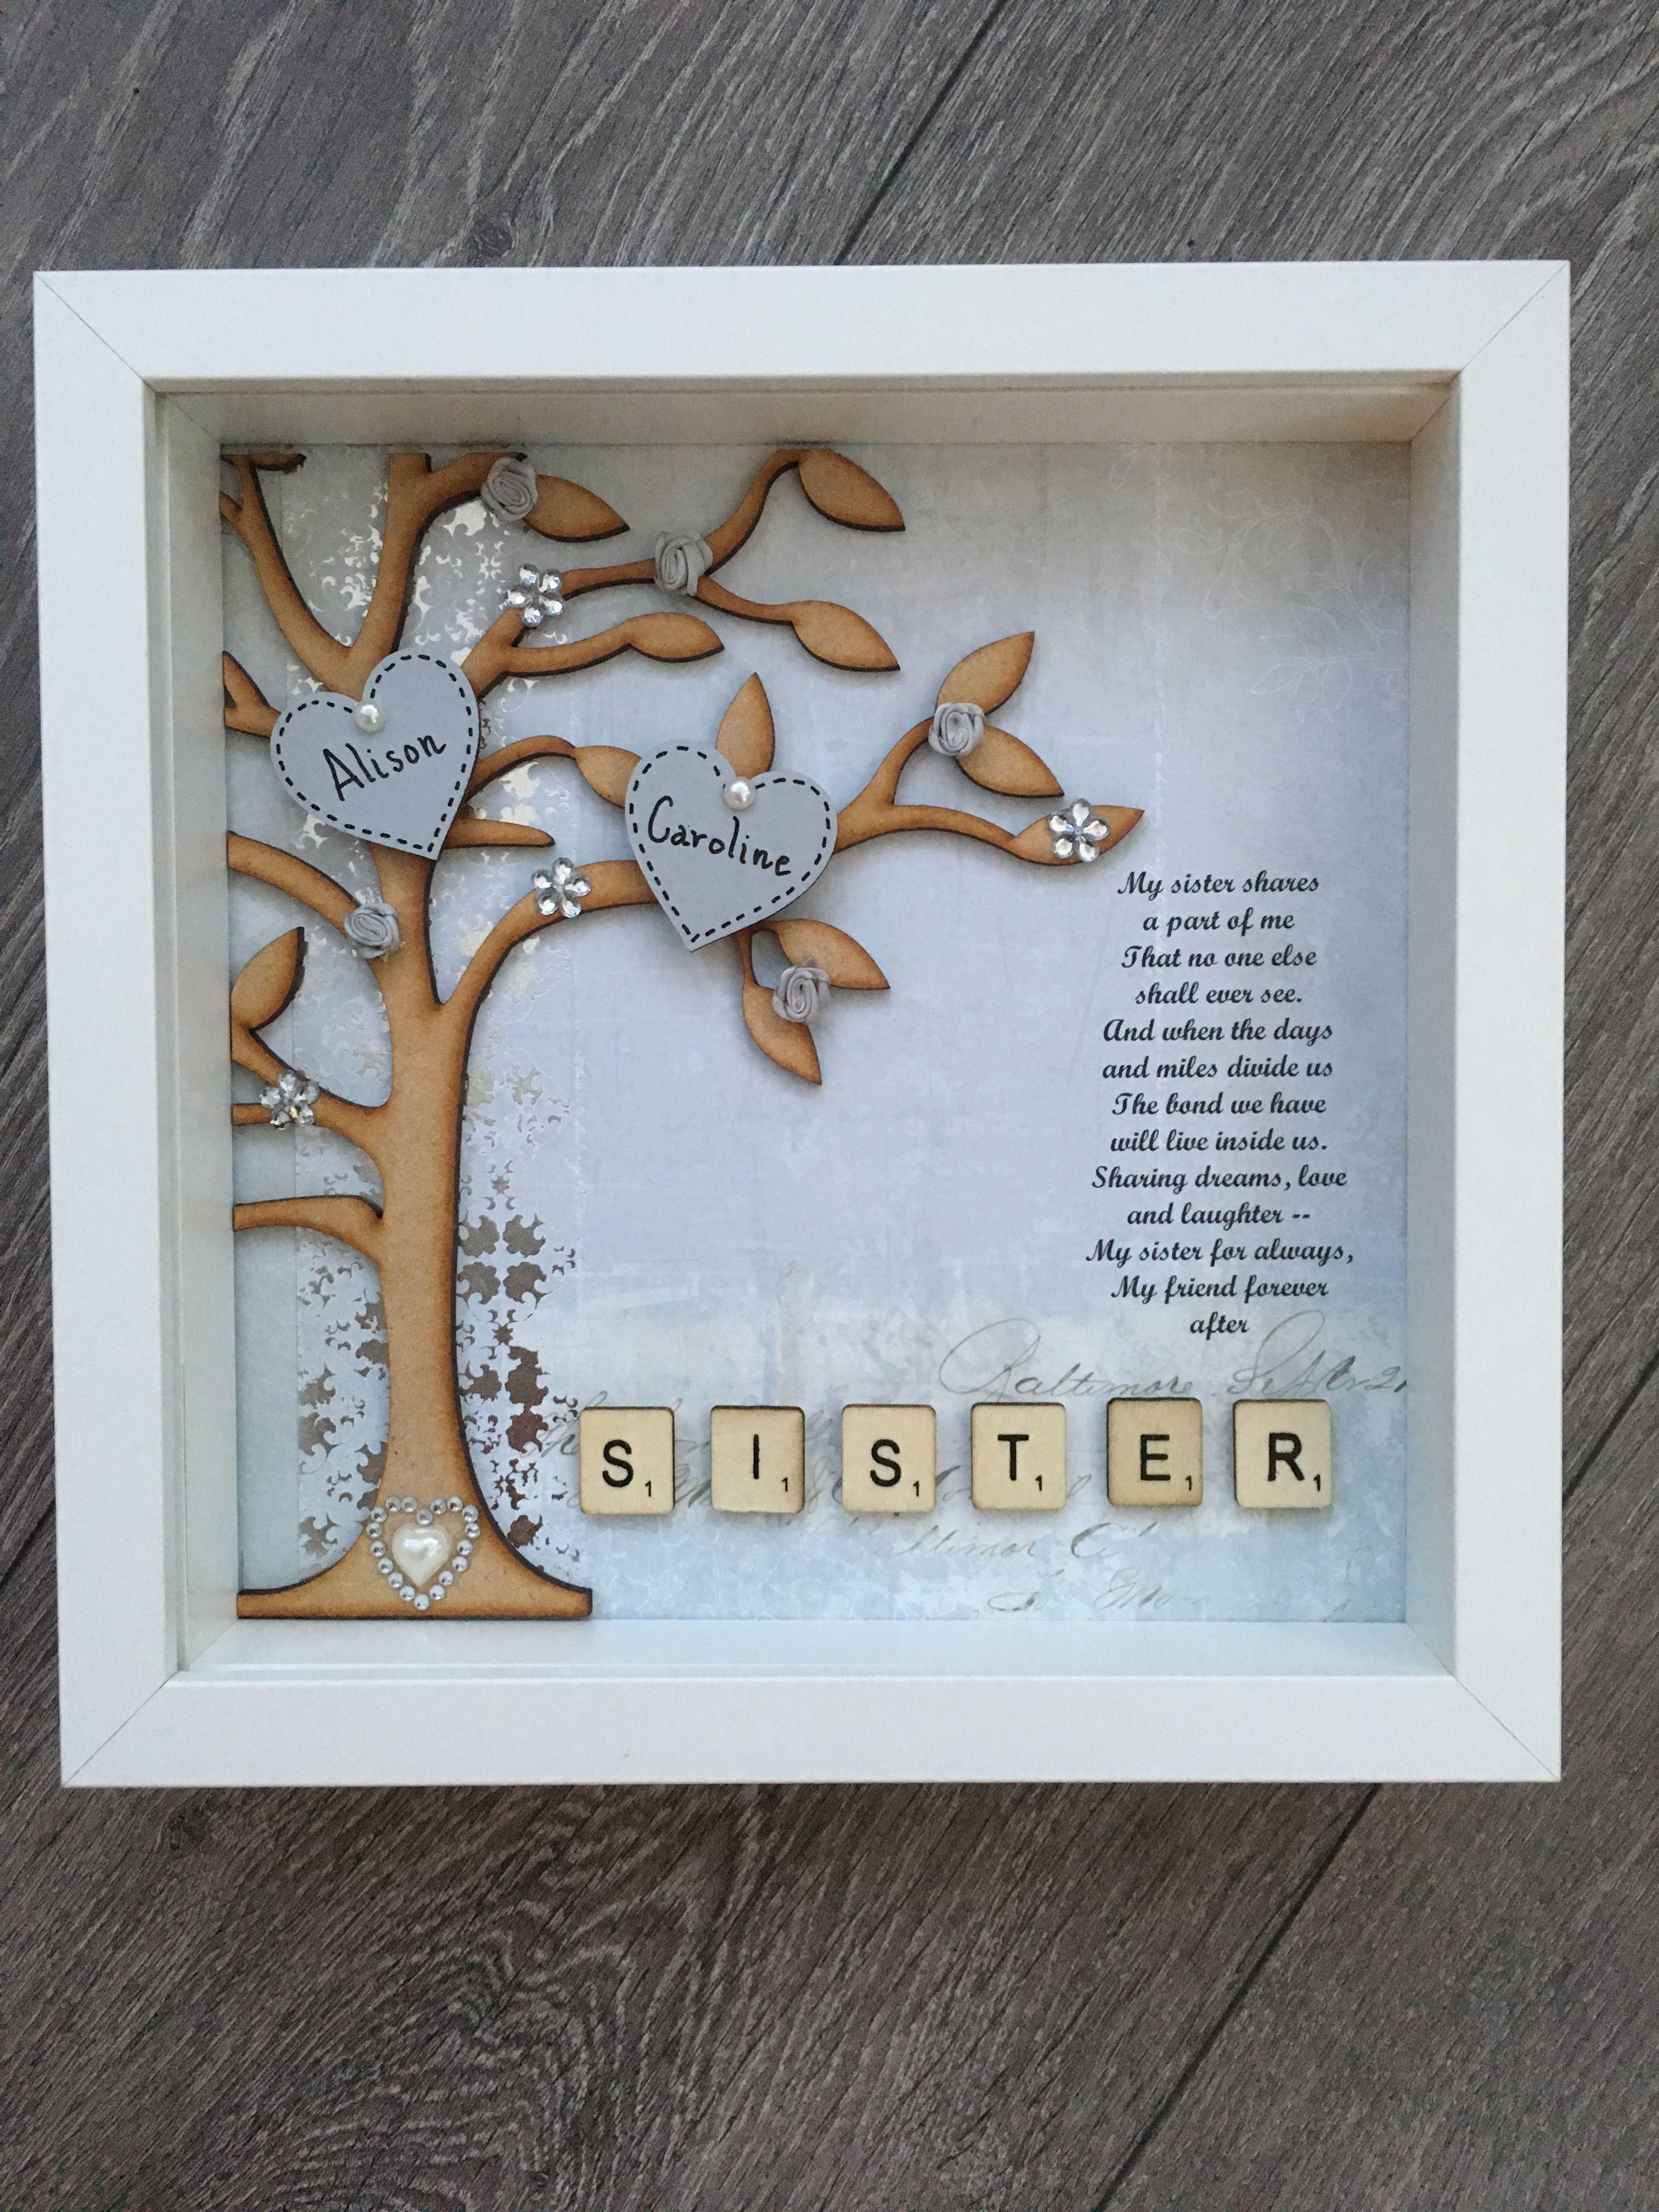 Box Frame Gift For A Sister Perfect Birthday Present Homemadegiftforsister